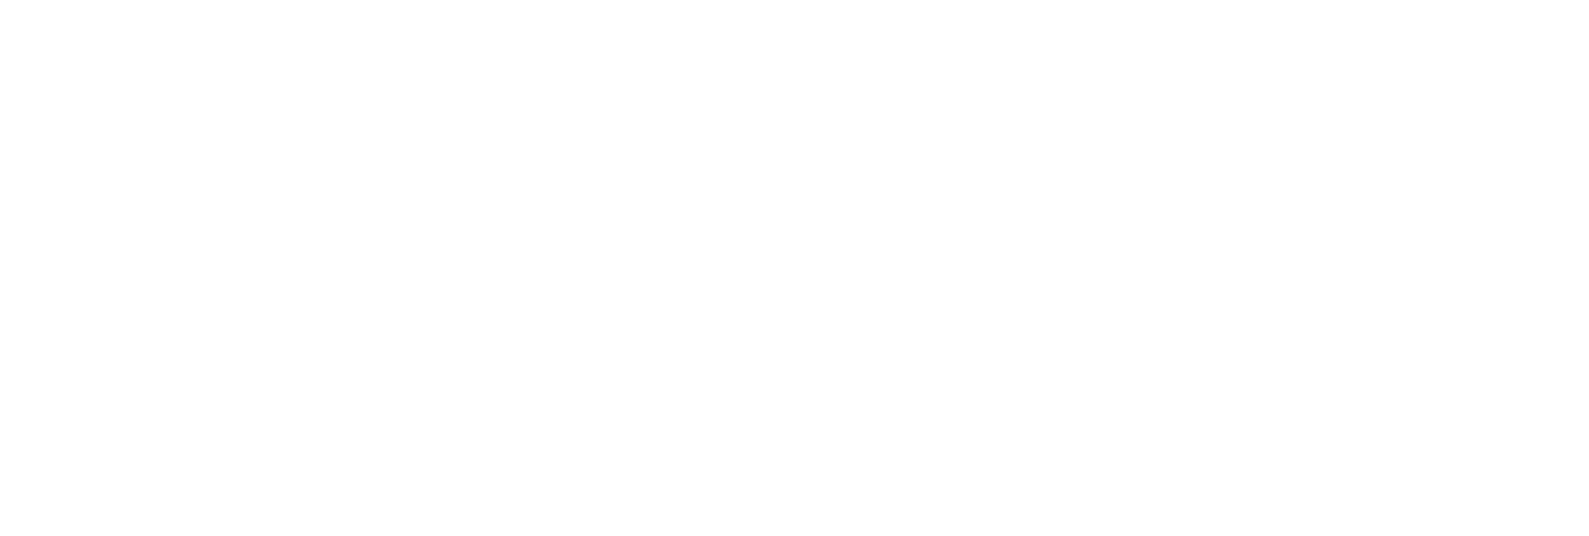 Welcome to Waterleaf Header Text